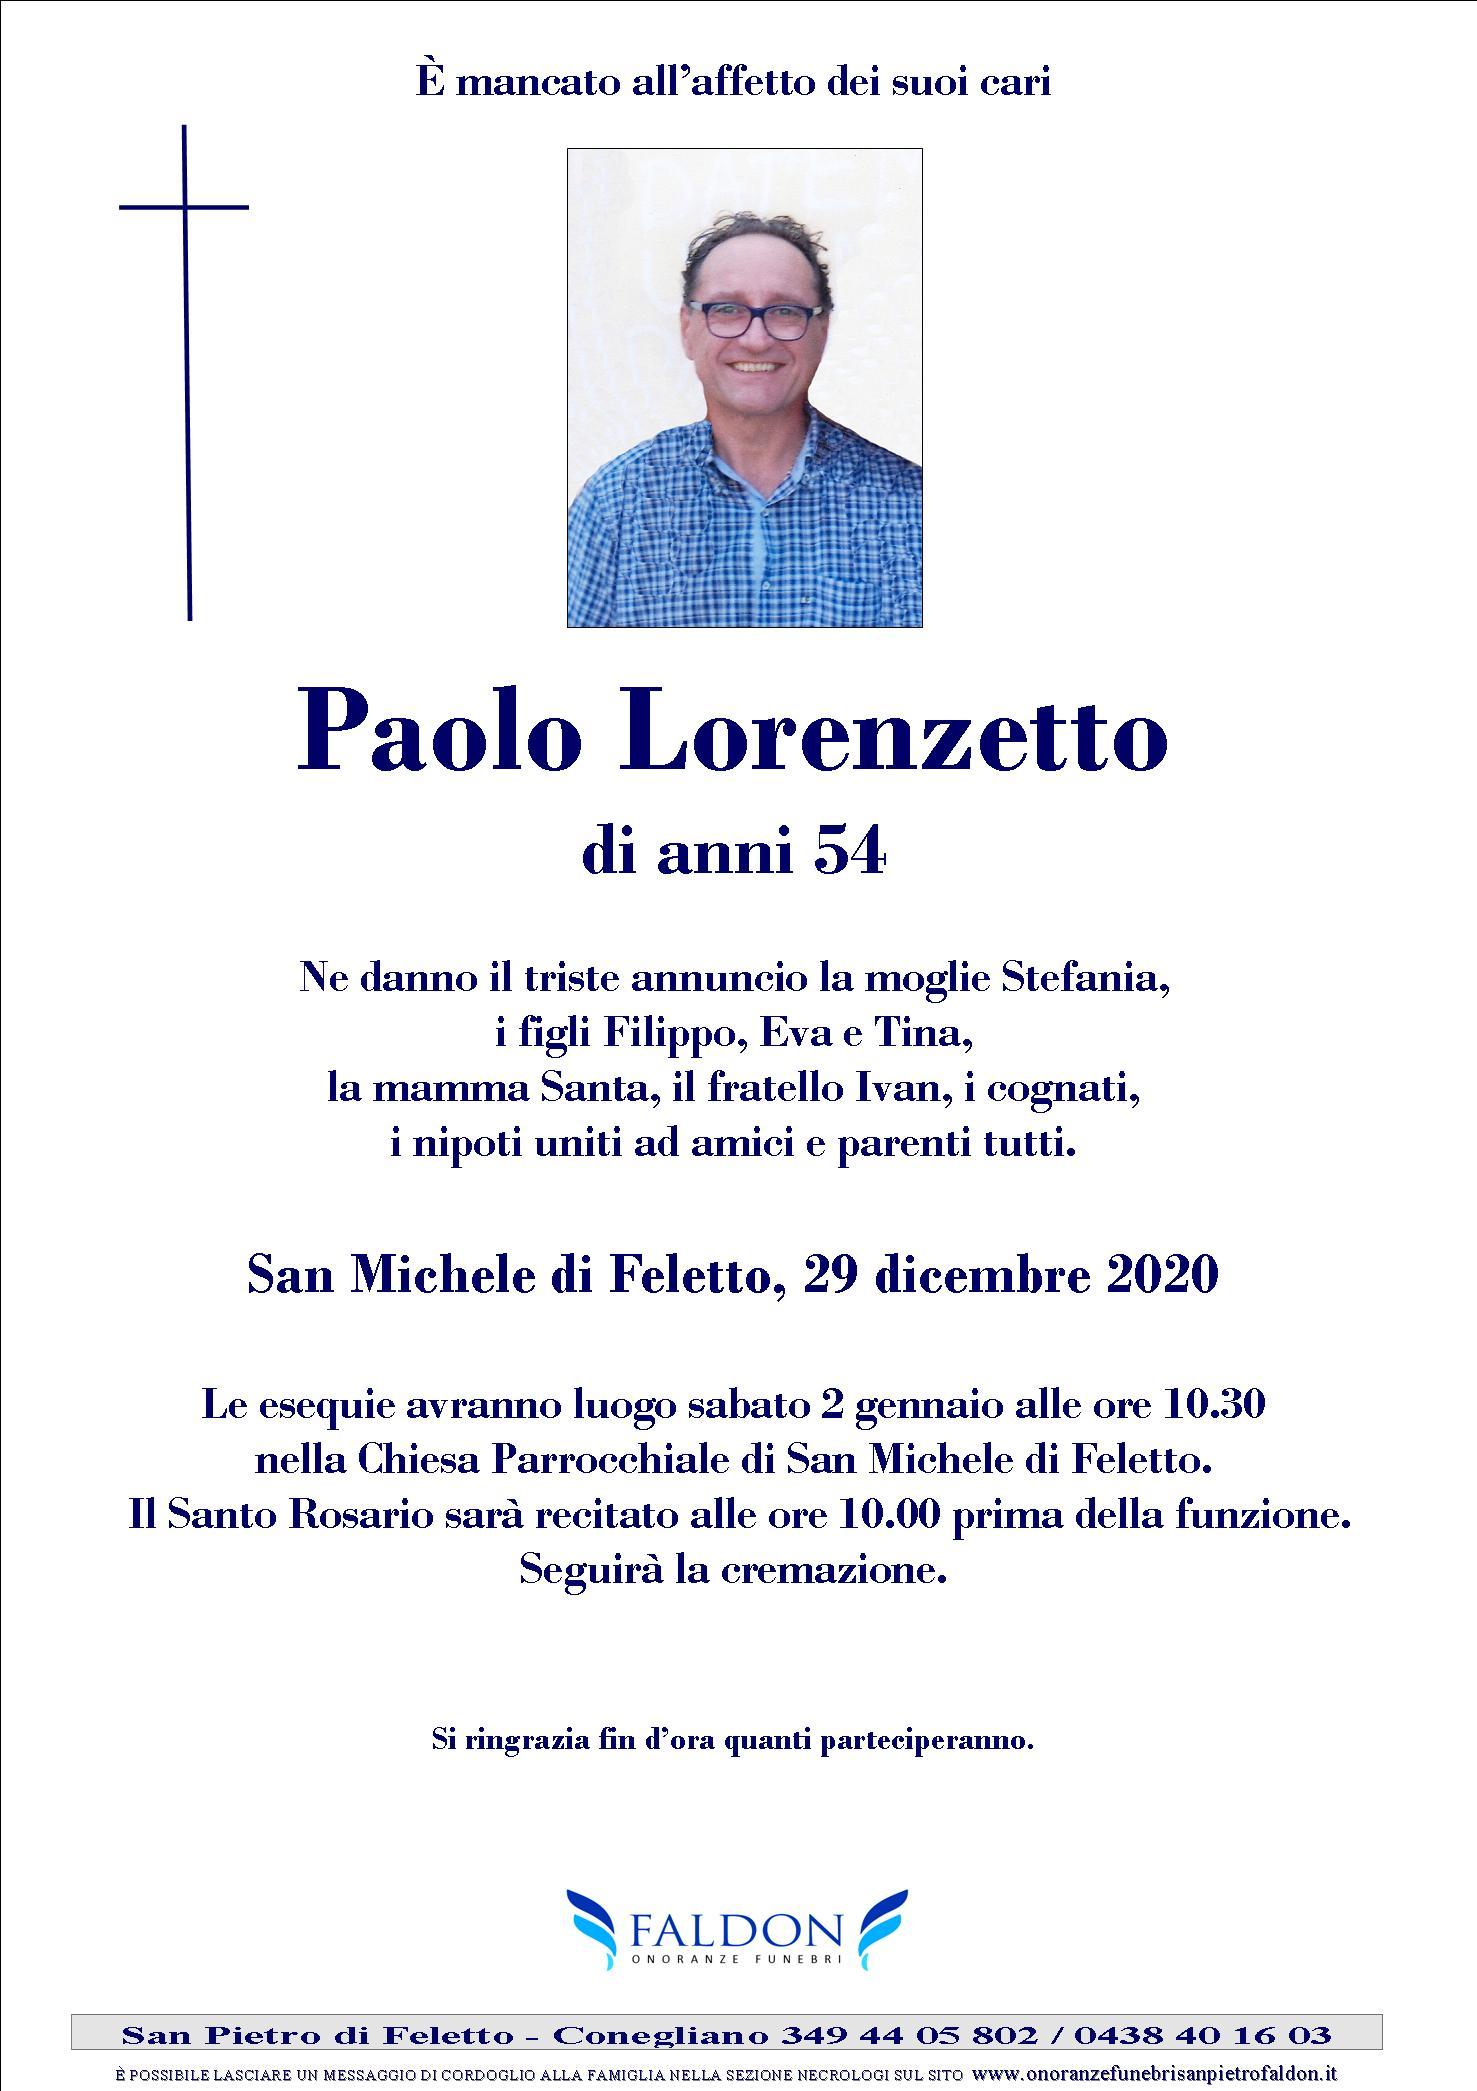 Paolo Lorenzetto